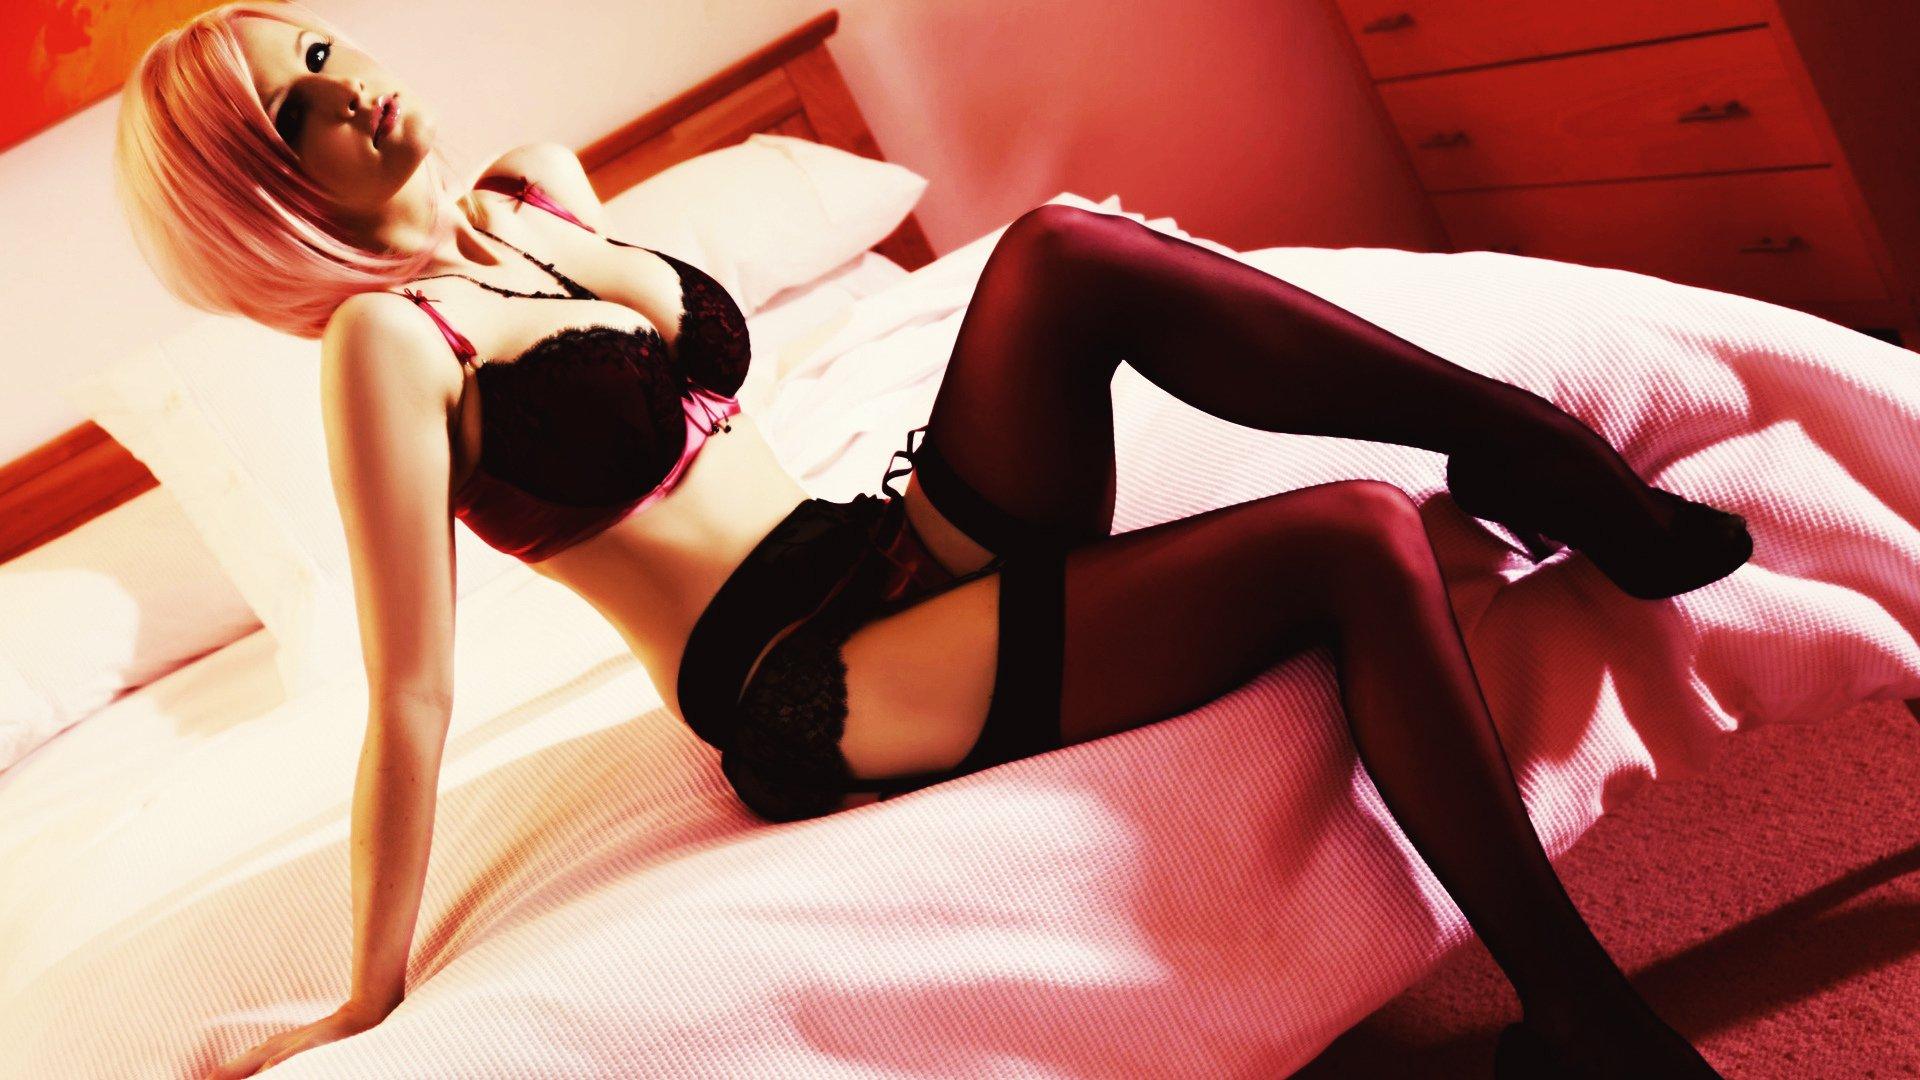 Фото девушек в чулках на кровати 18 фотография